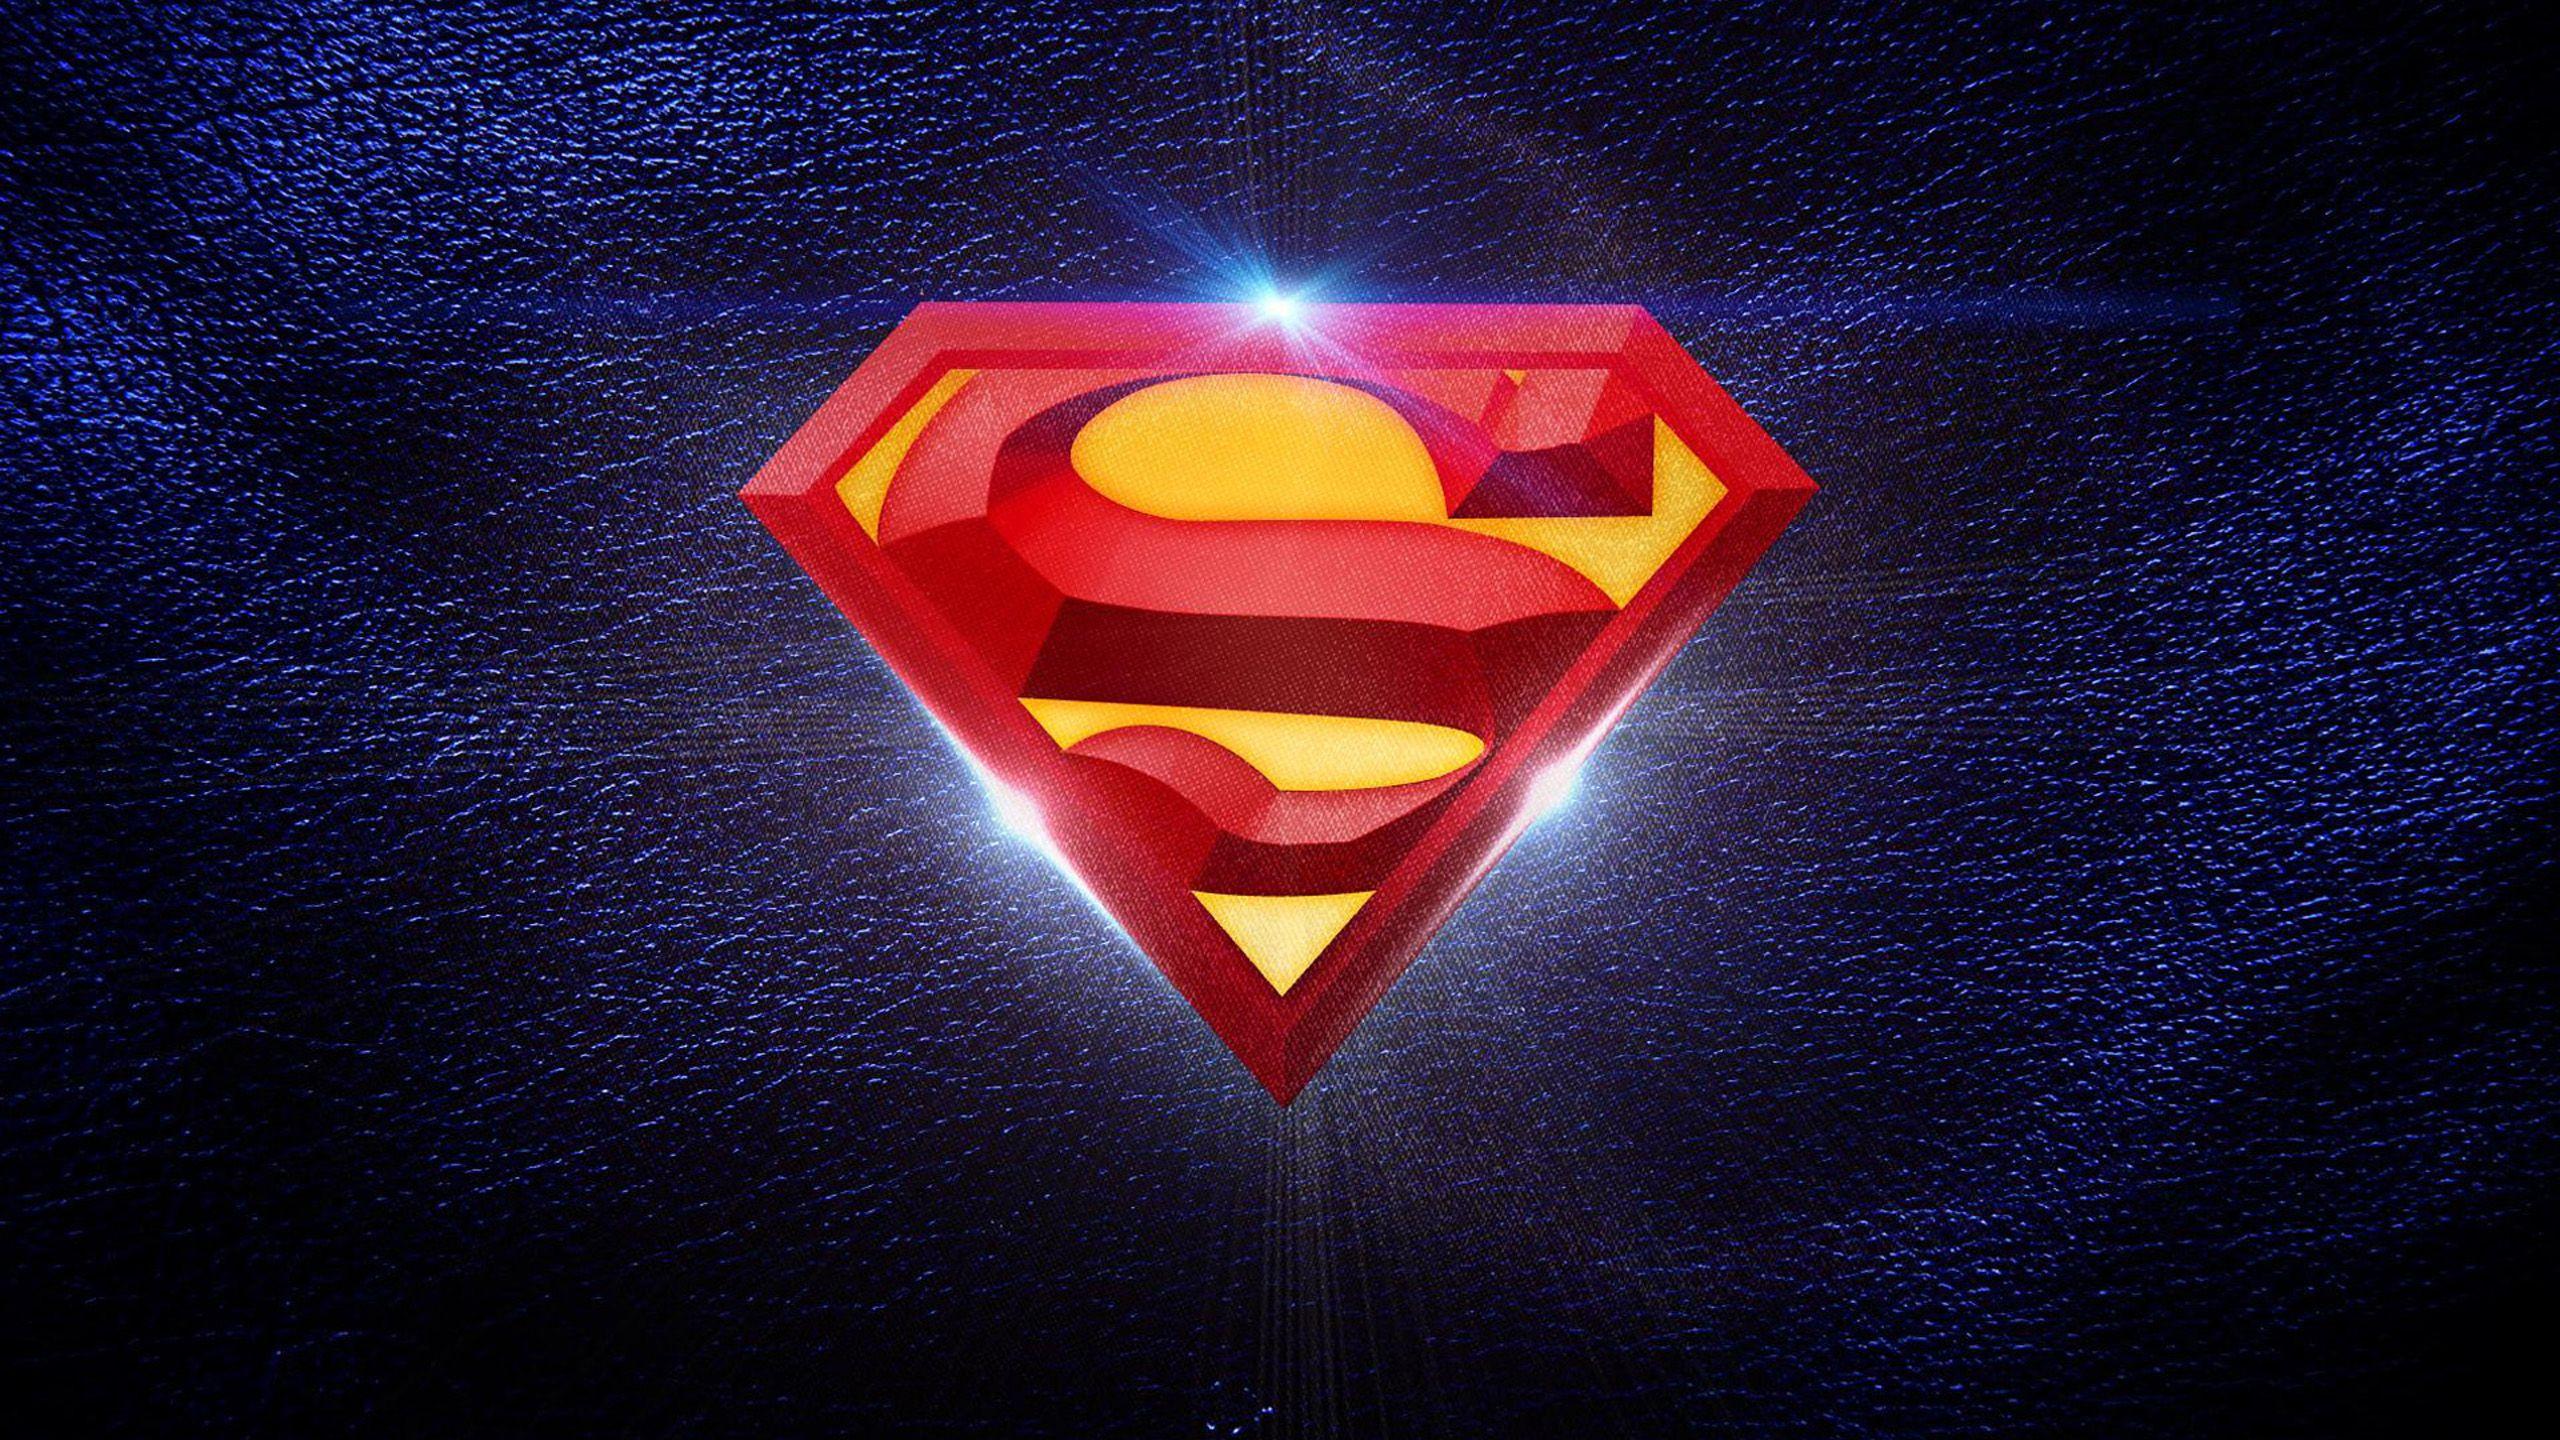 ideas about superman logo wallpaper on pinterest